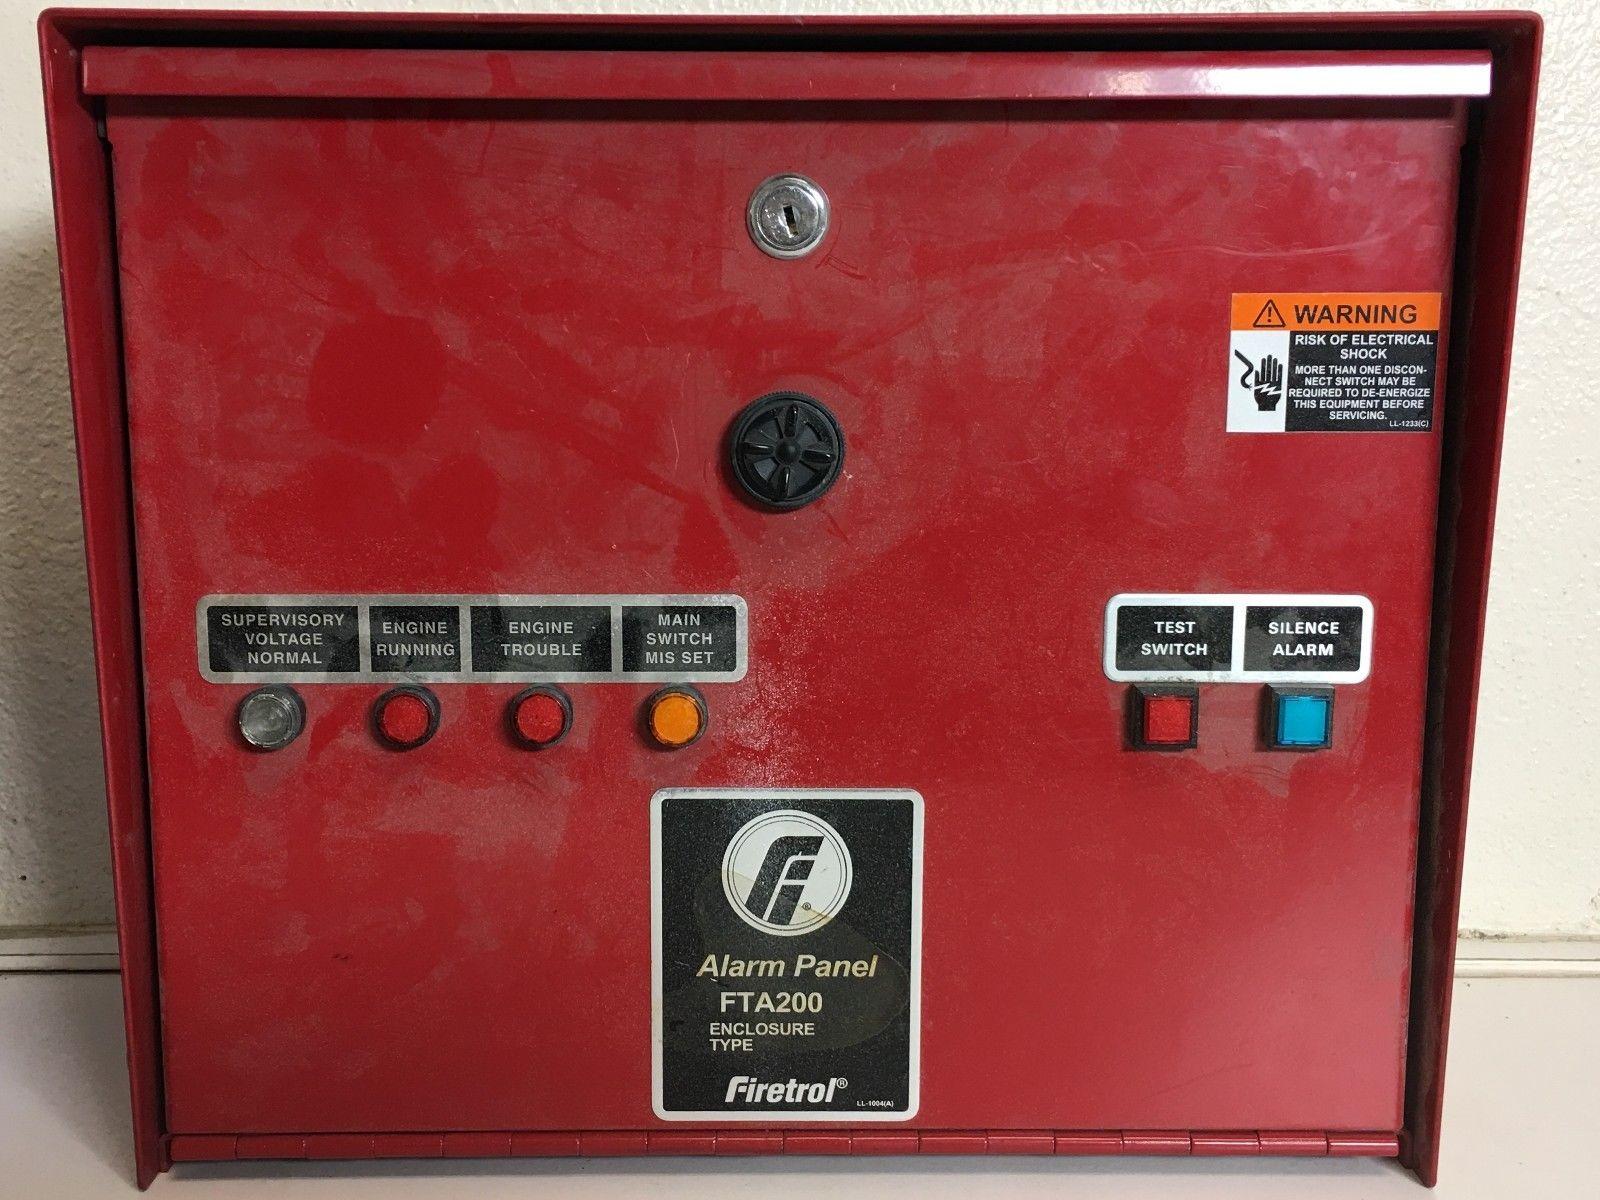 Lot 7A - FIRETROL ALARM PANEL FTA200 ENCLOSURE TYPE